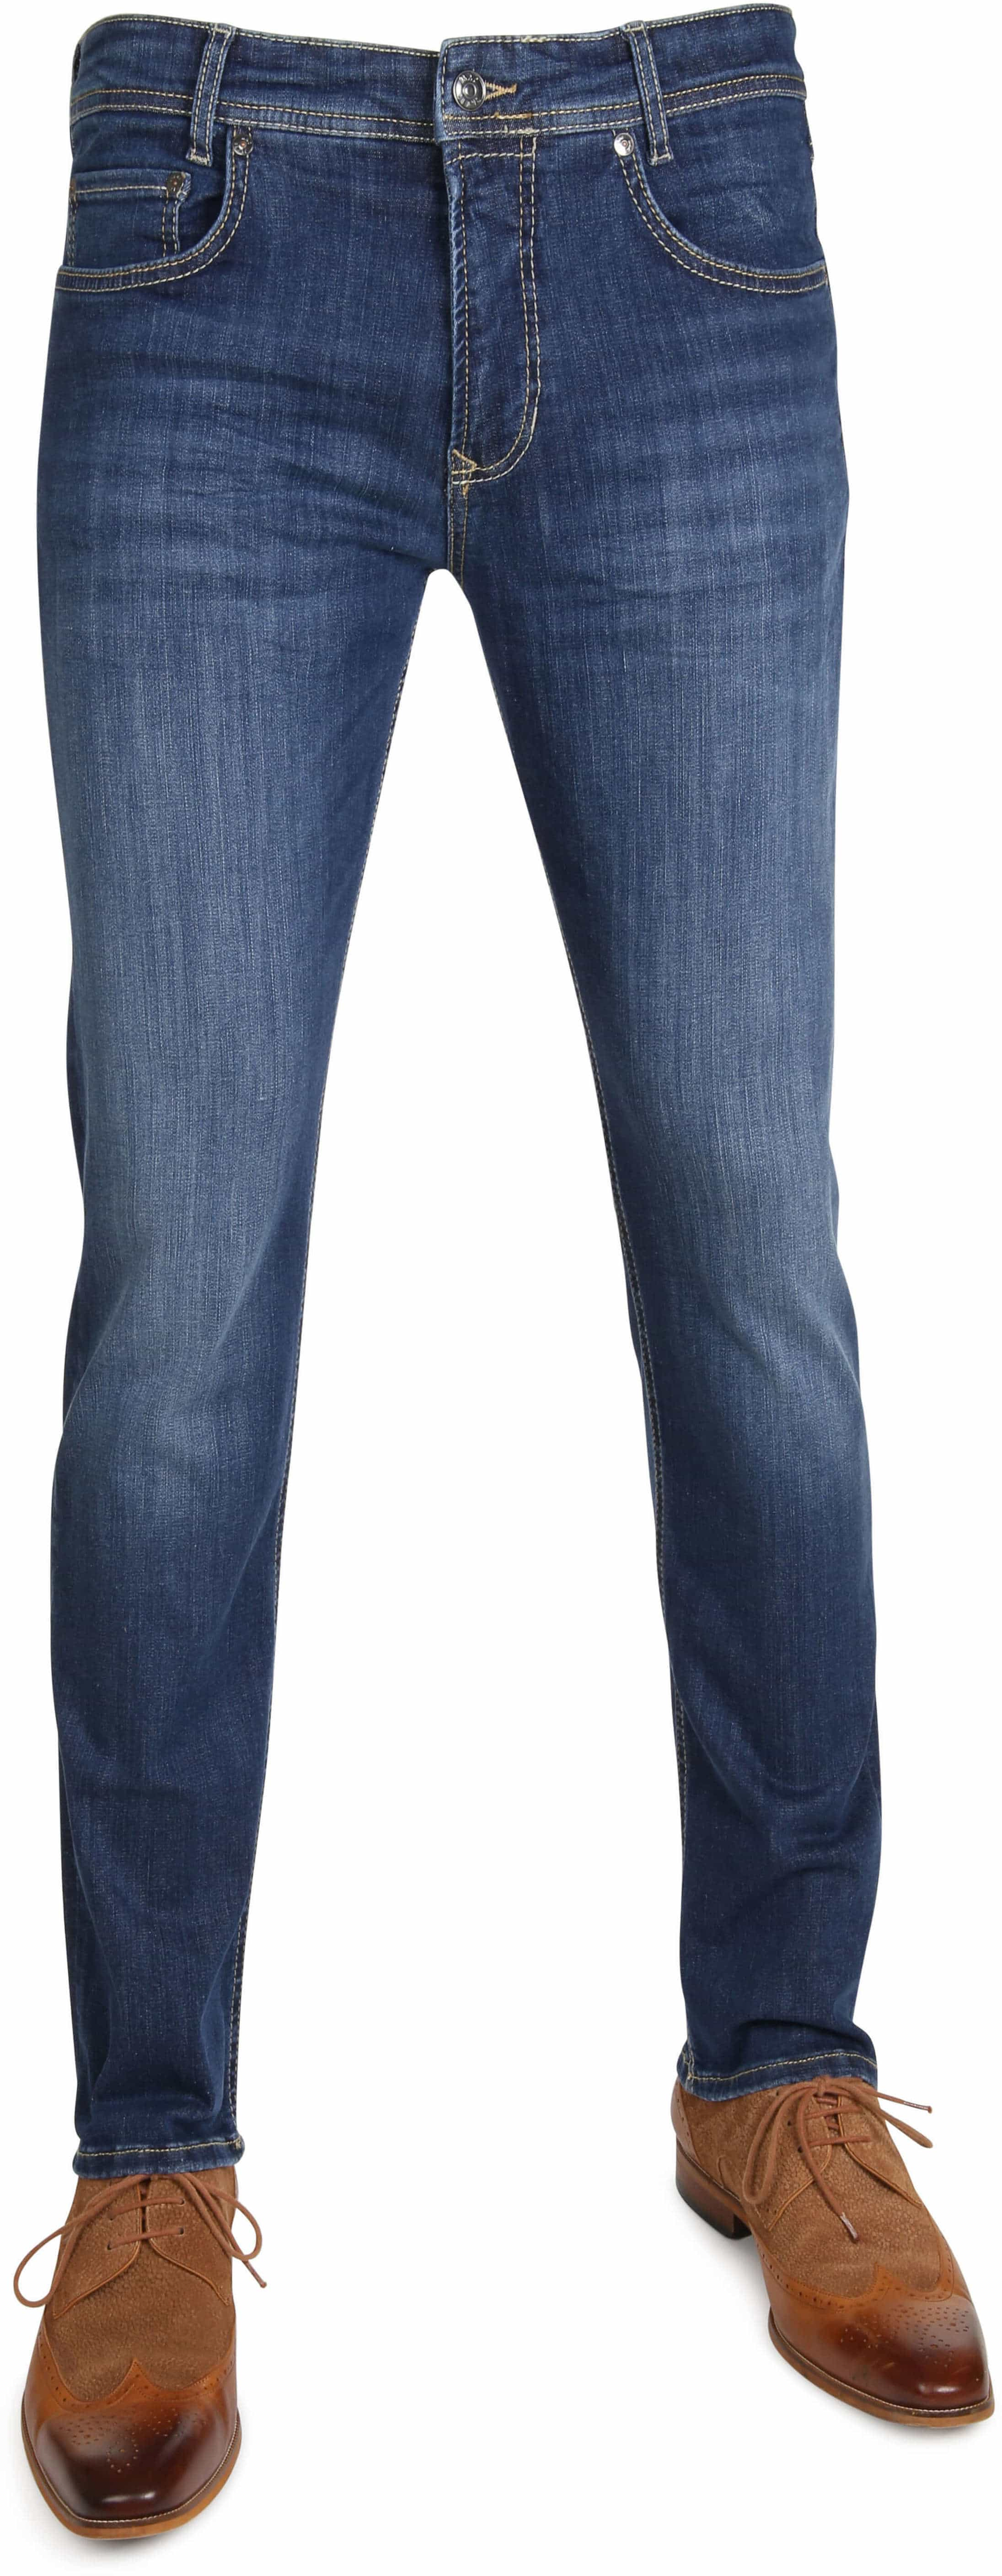 Mac Jeans Flexx H554 foto 0